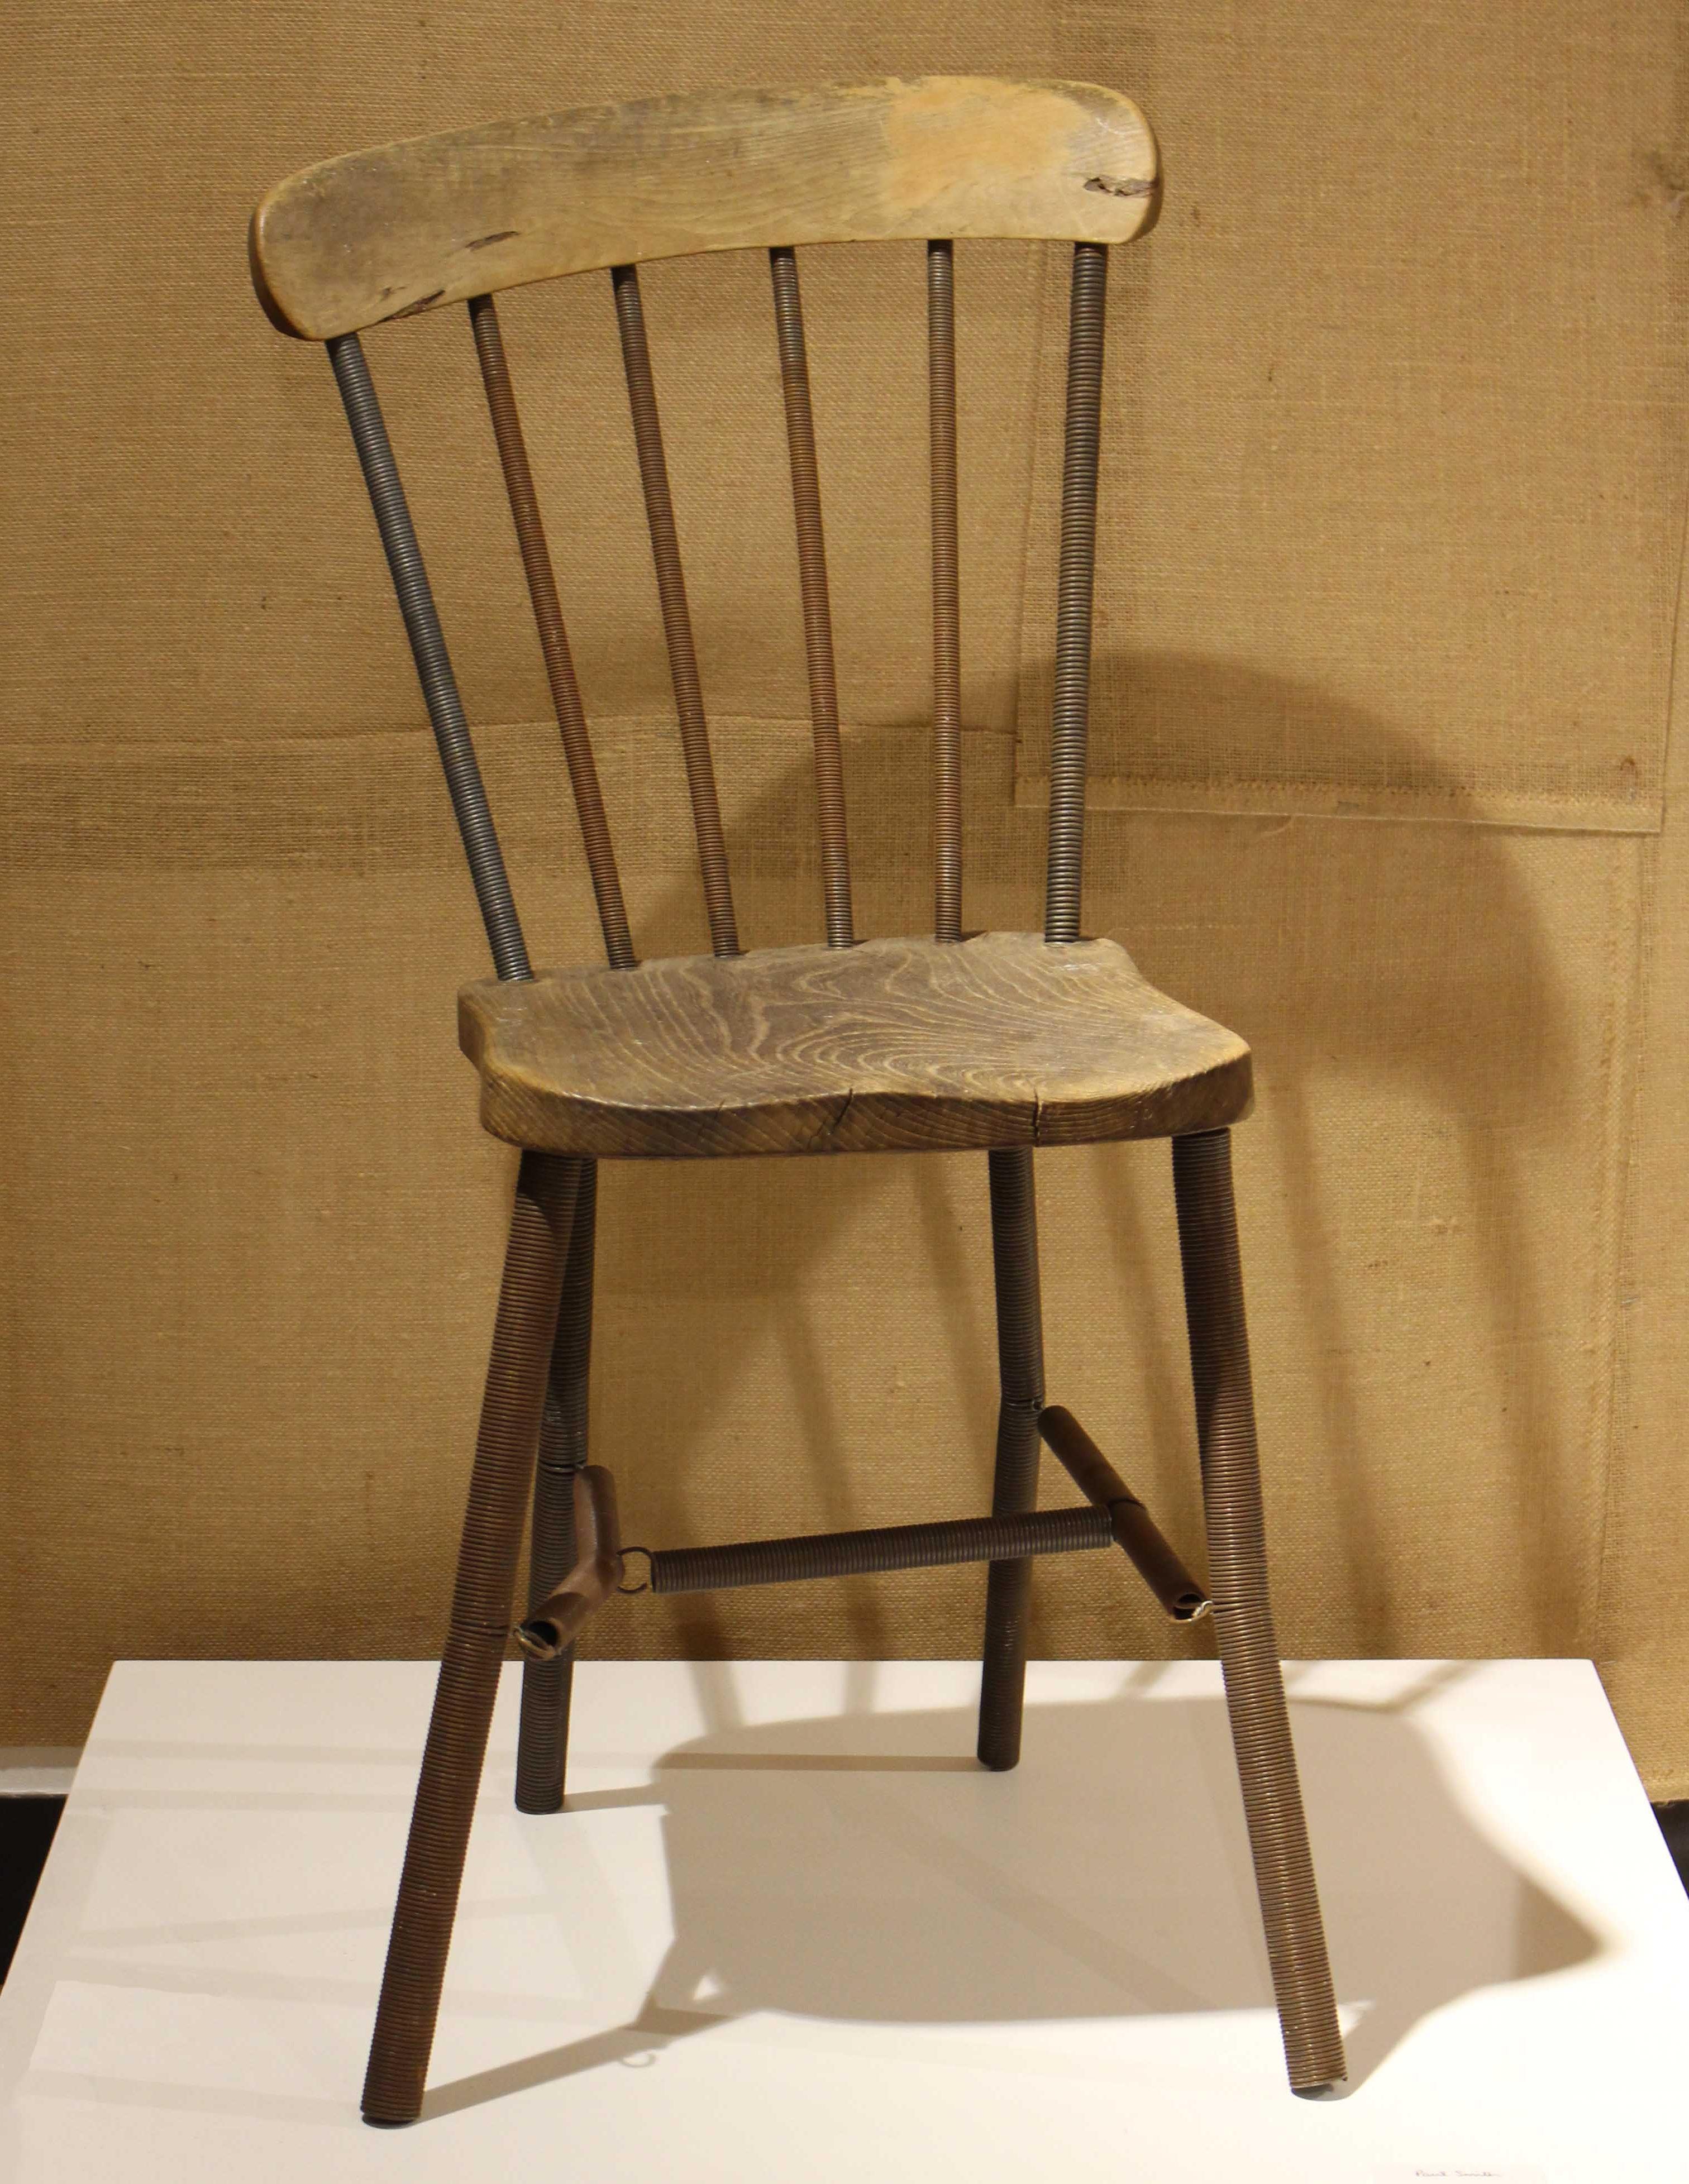 Spring Chair 2